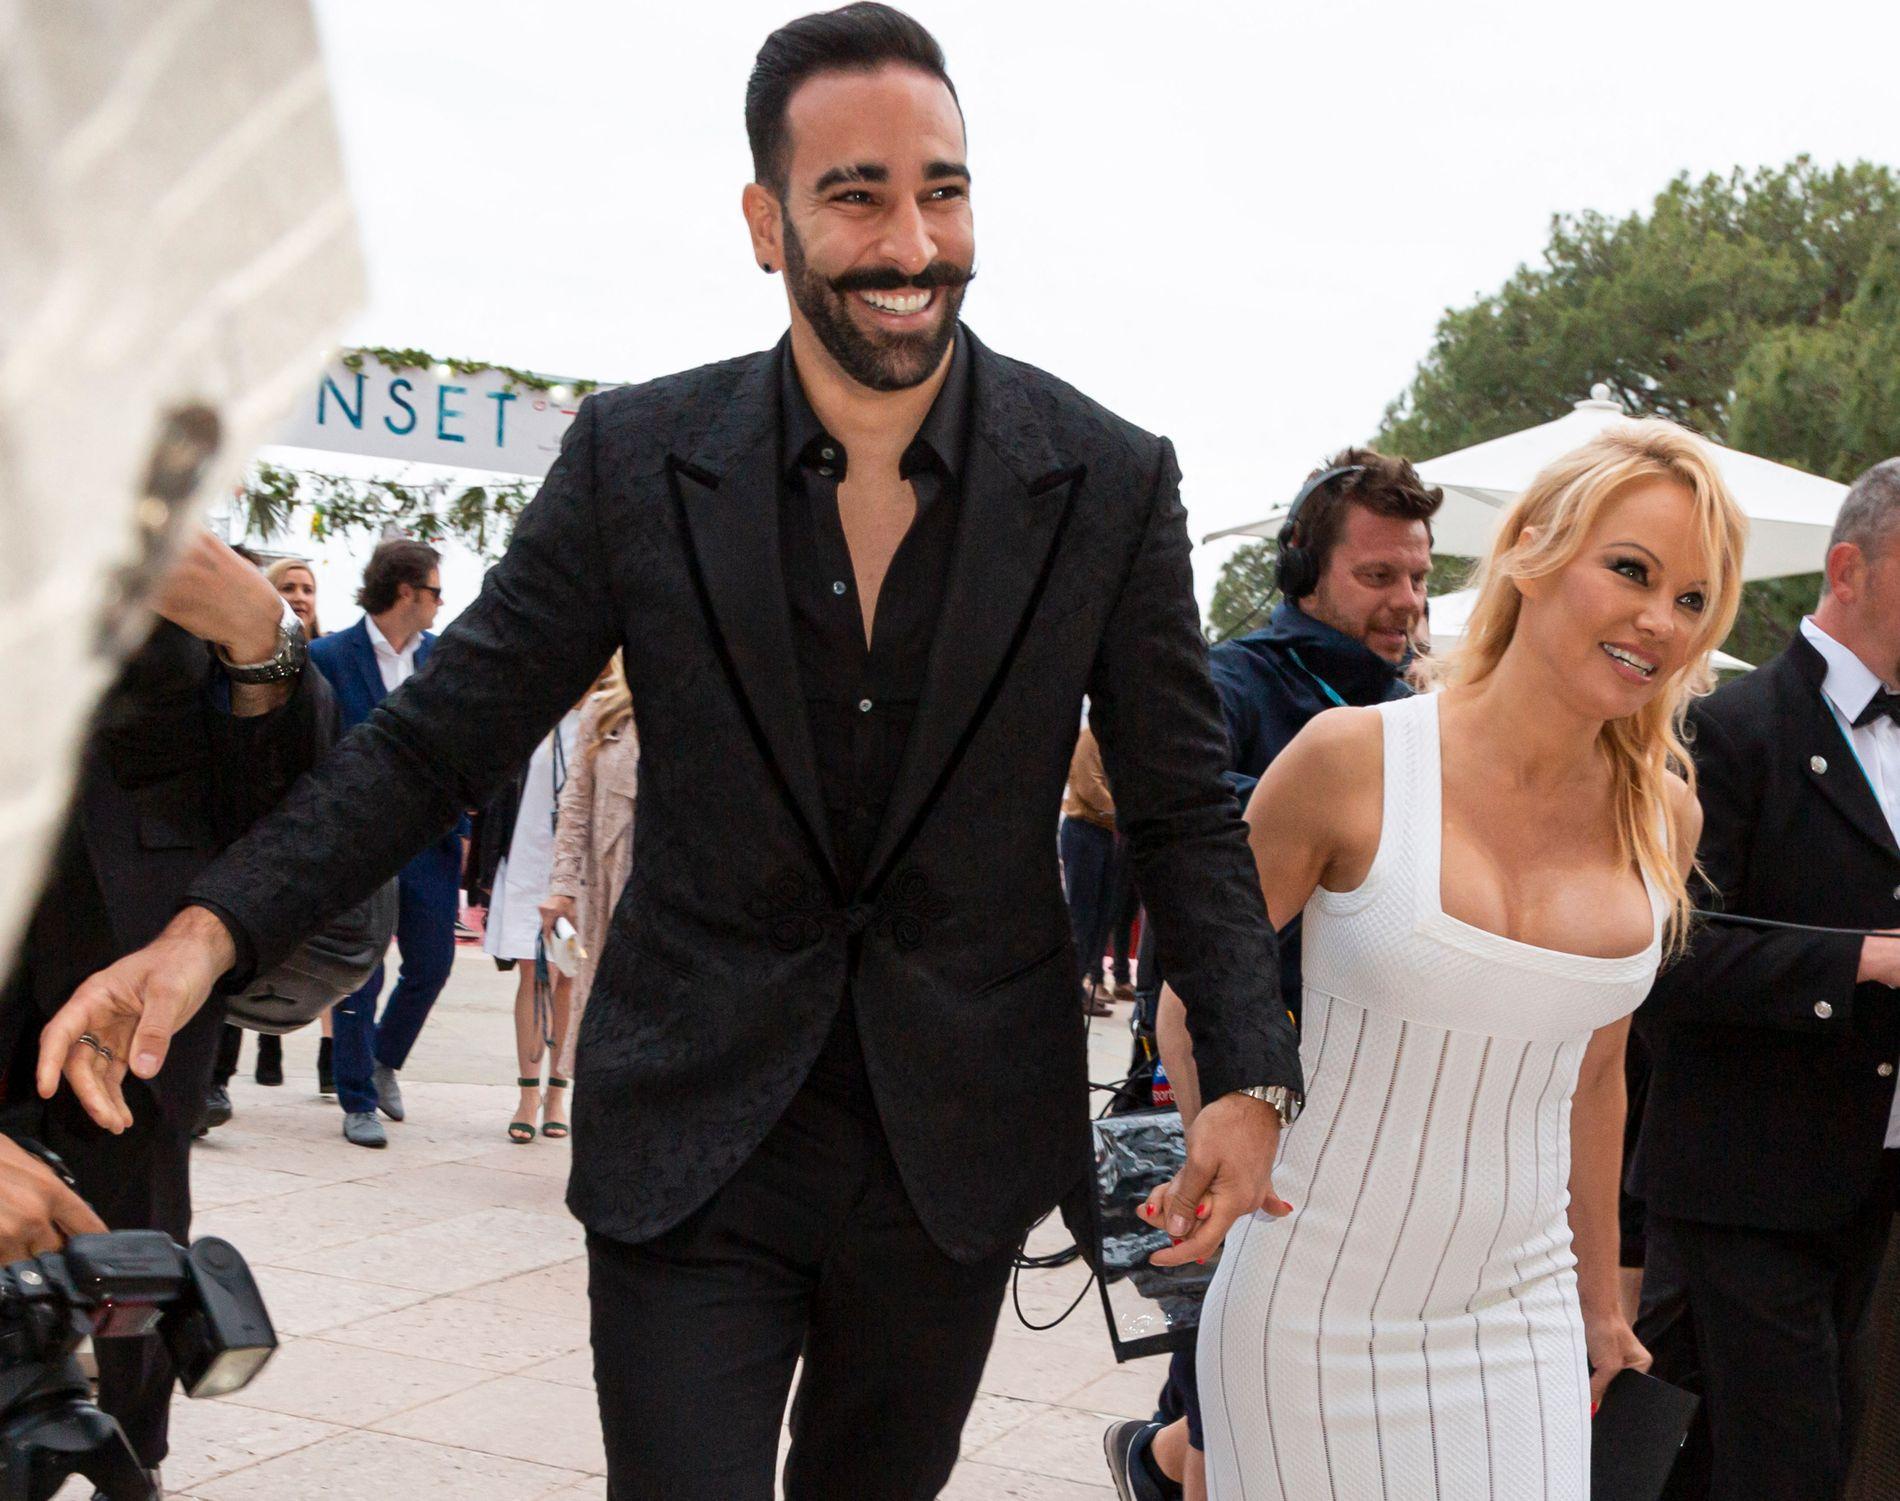 49939ded HÅND I HÅND: Adil Rami og Pamela Anderson på moteshowet i Monaco. Foto:  Piovanotto Marco/ABACA / ABACA